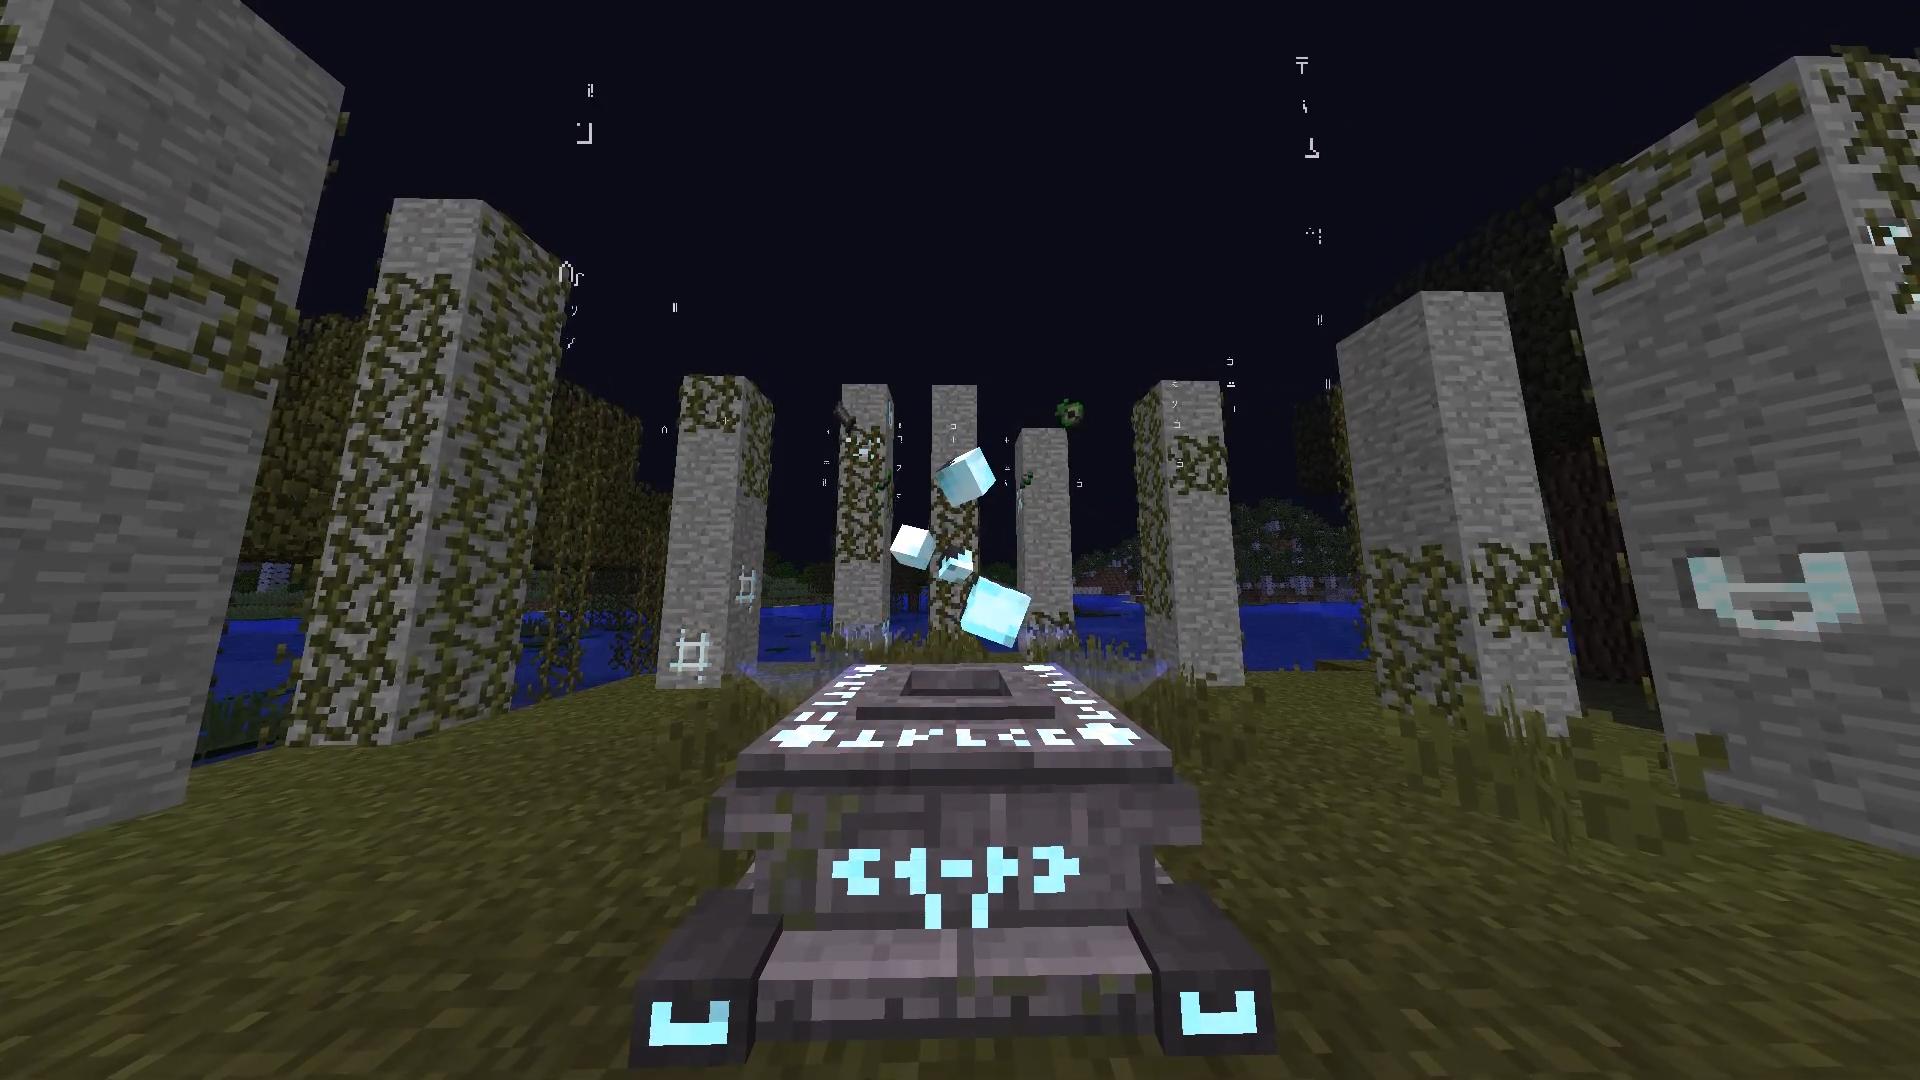 Мод The Betweenlands (мистическое болото) - скриншот 7